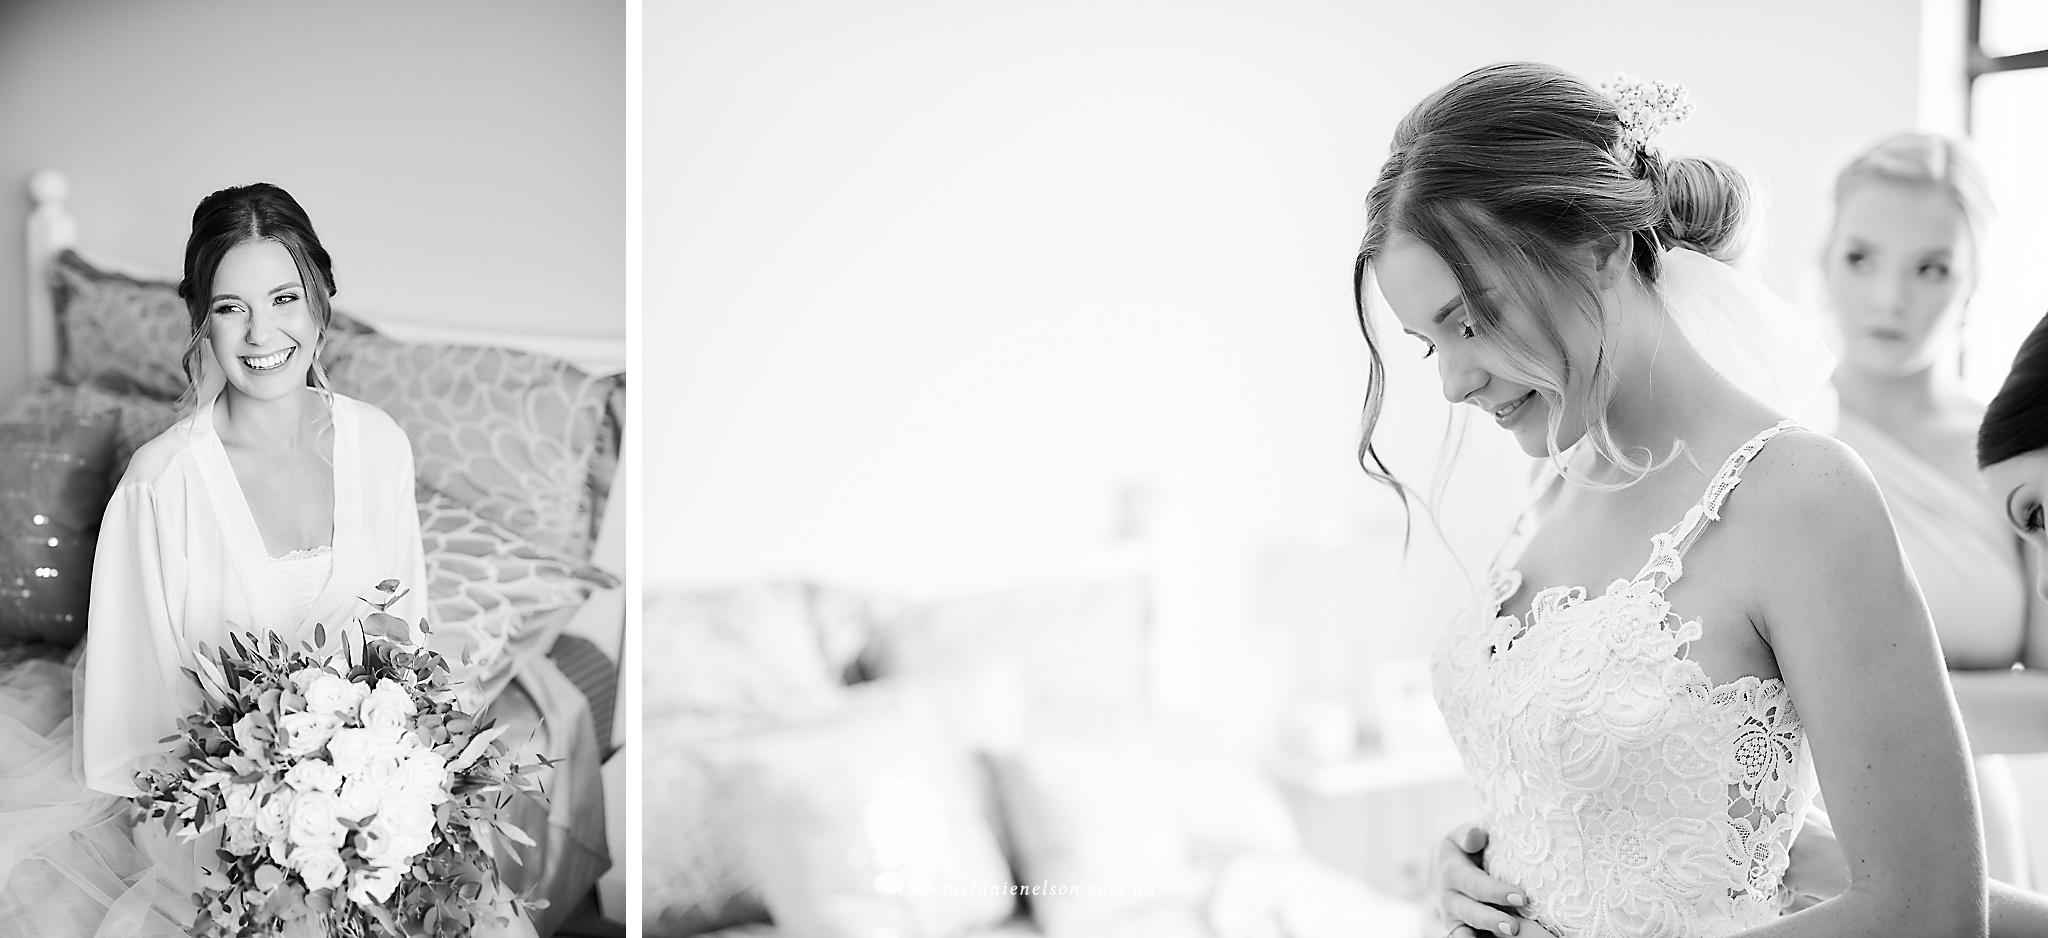 serafino_wedding_photography_0017.jpg